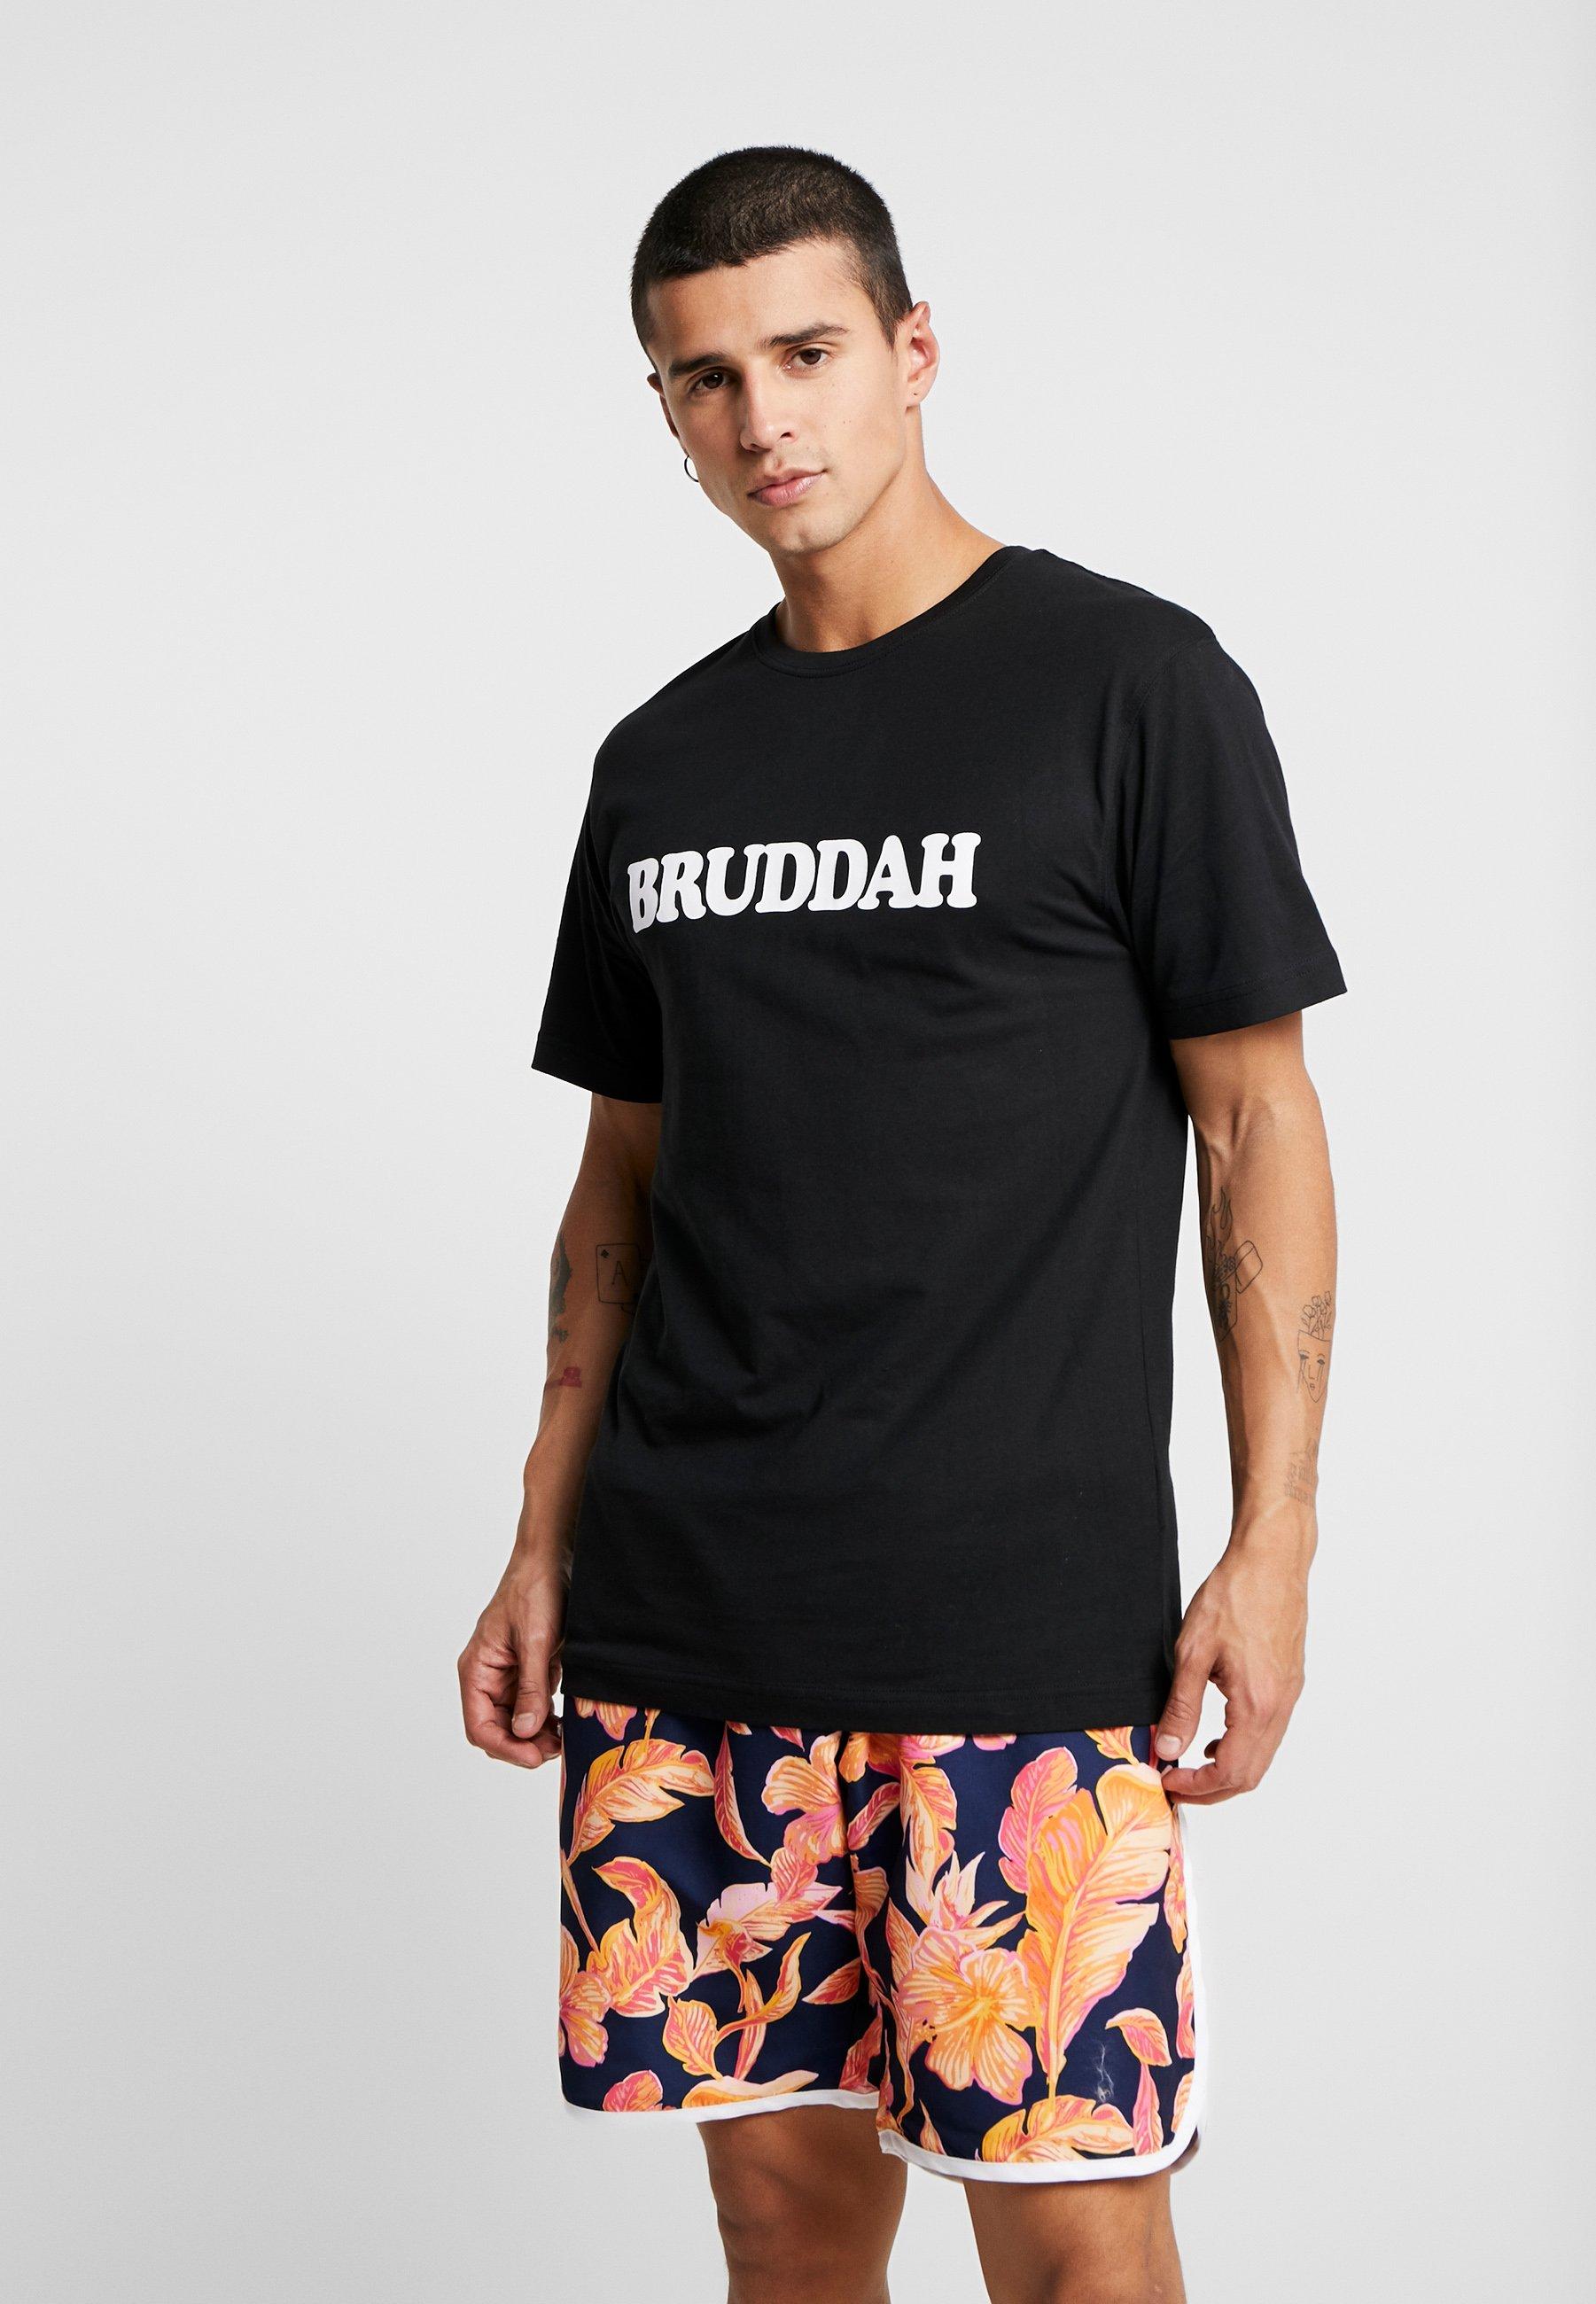 TeeT Black Imprimé white Cayleramp; Bruddah Sons shirt CxodrBe